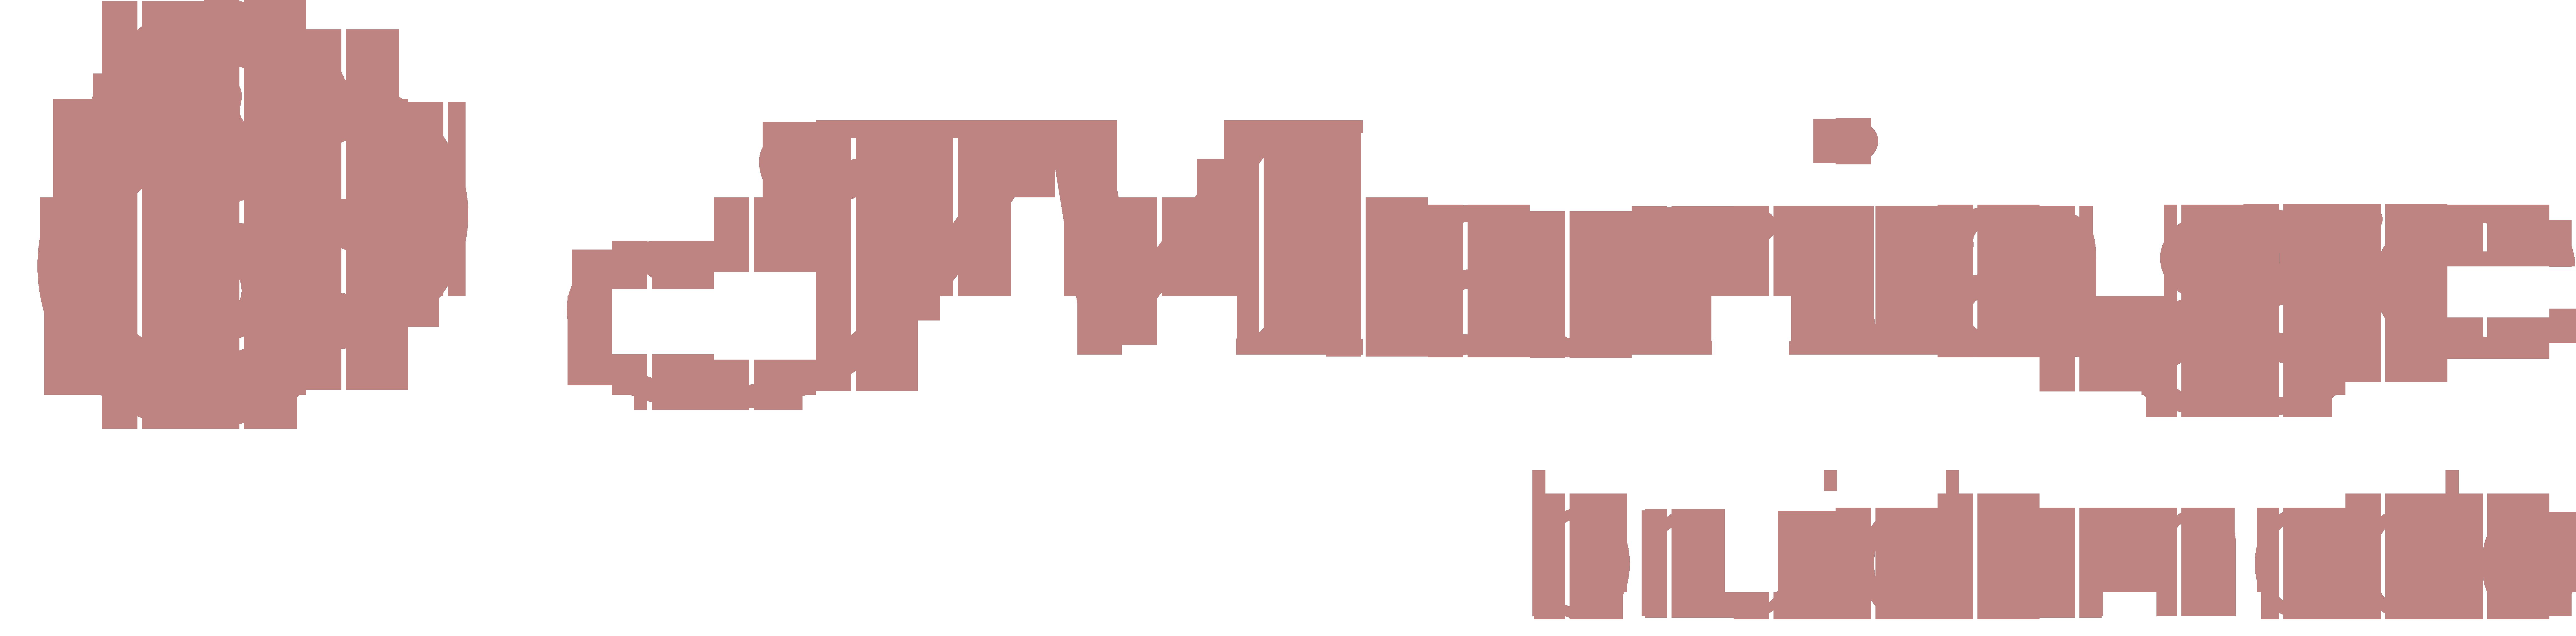 Bruidsmode van topmerken in de bruidsindustrie | Mariage Bruidsmode